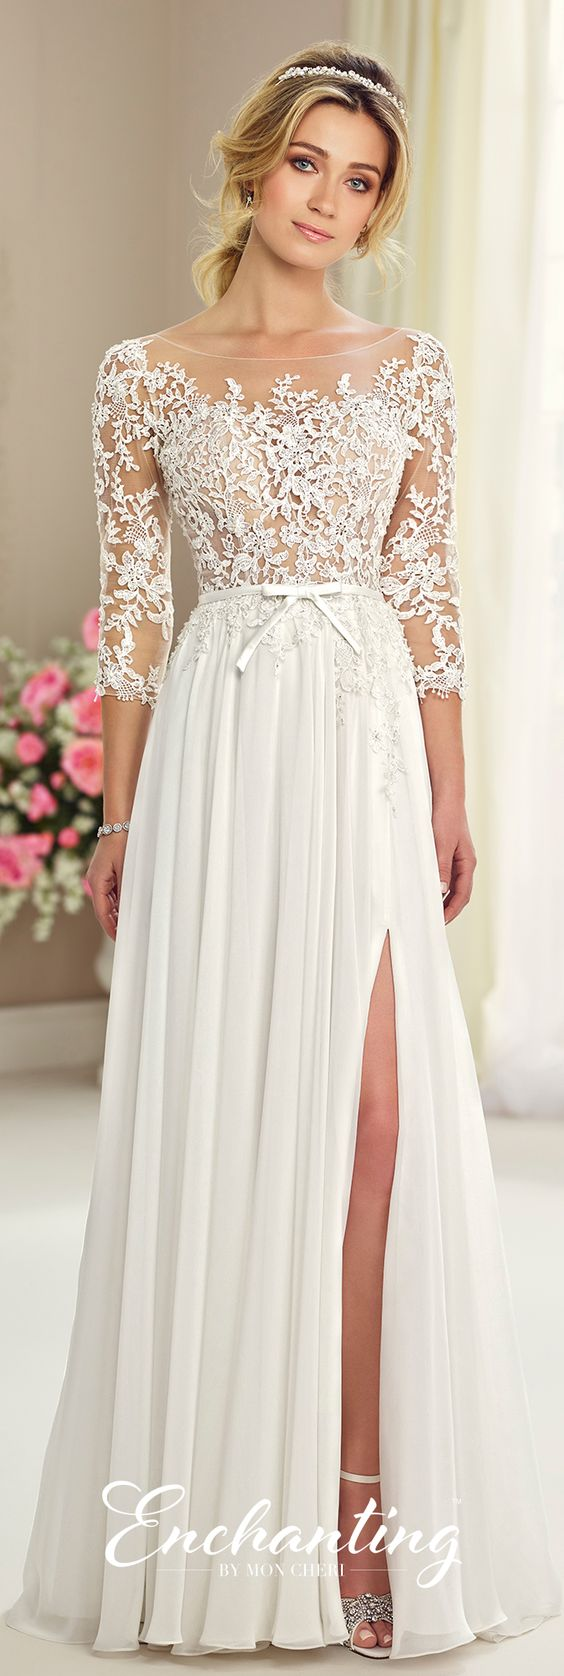 image source: mon cheri bridals